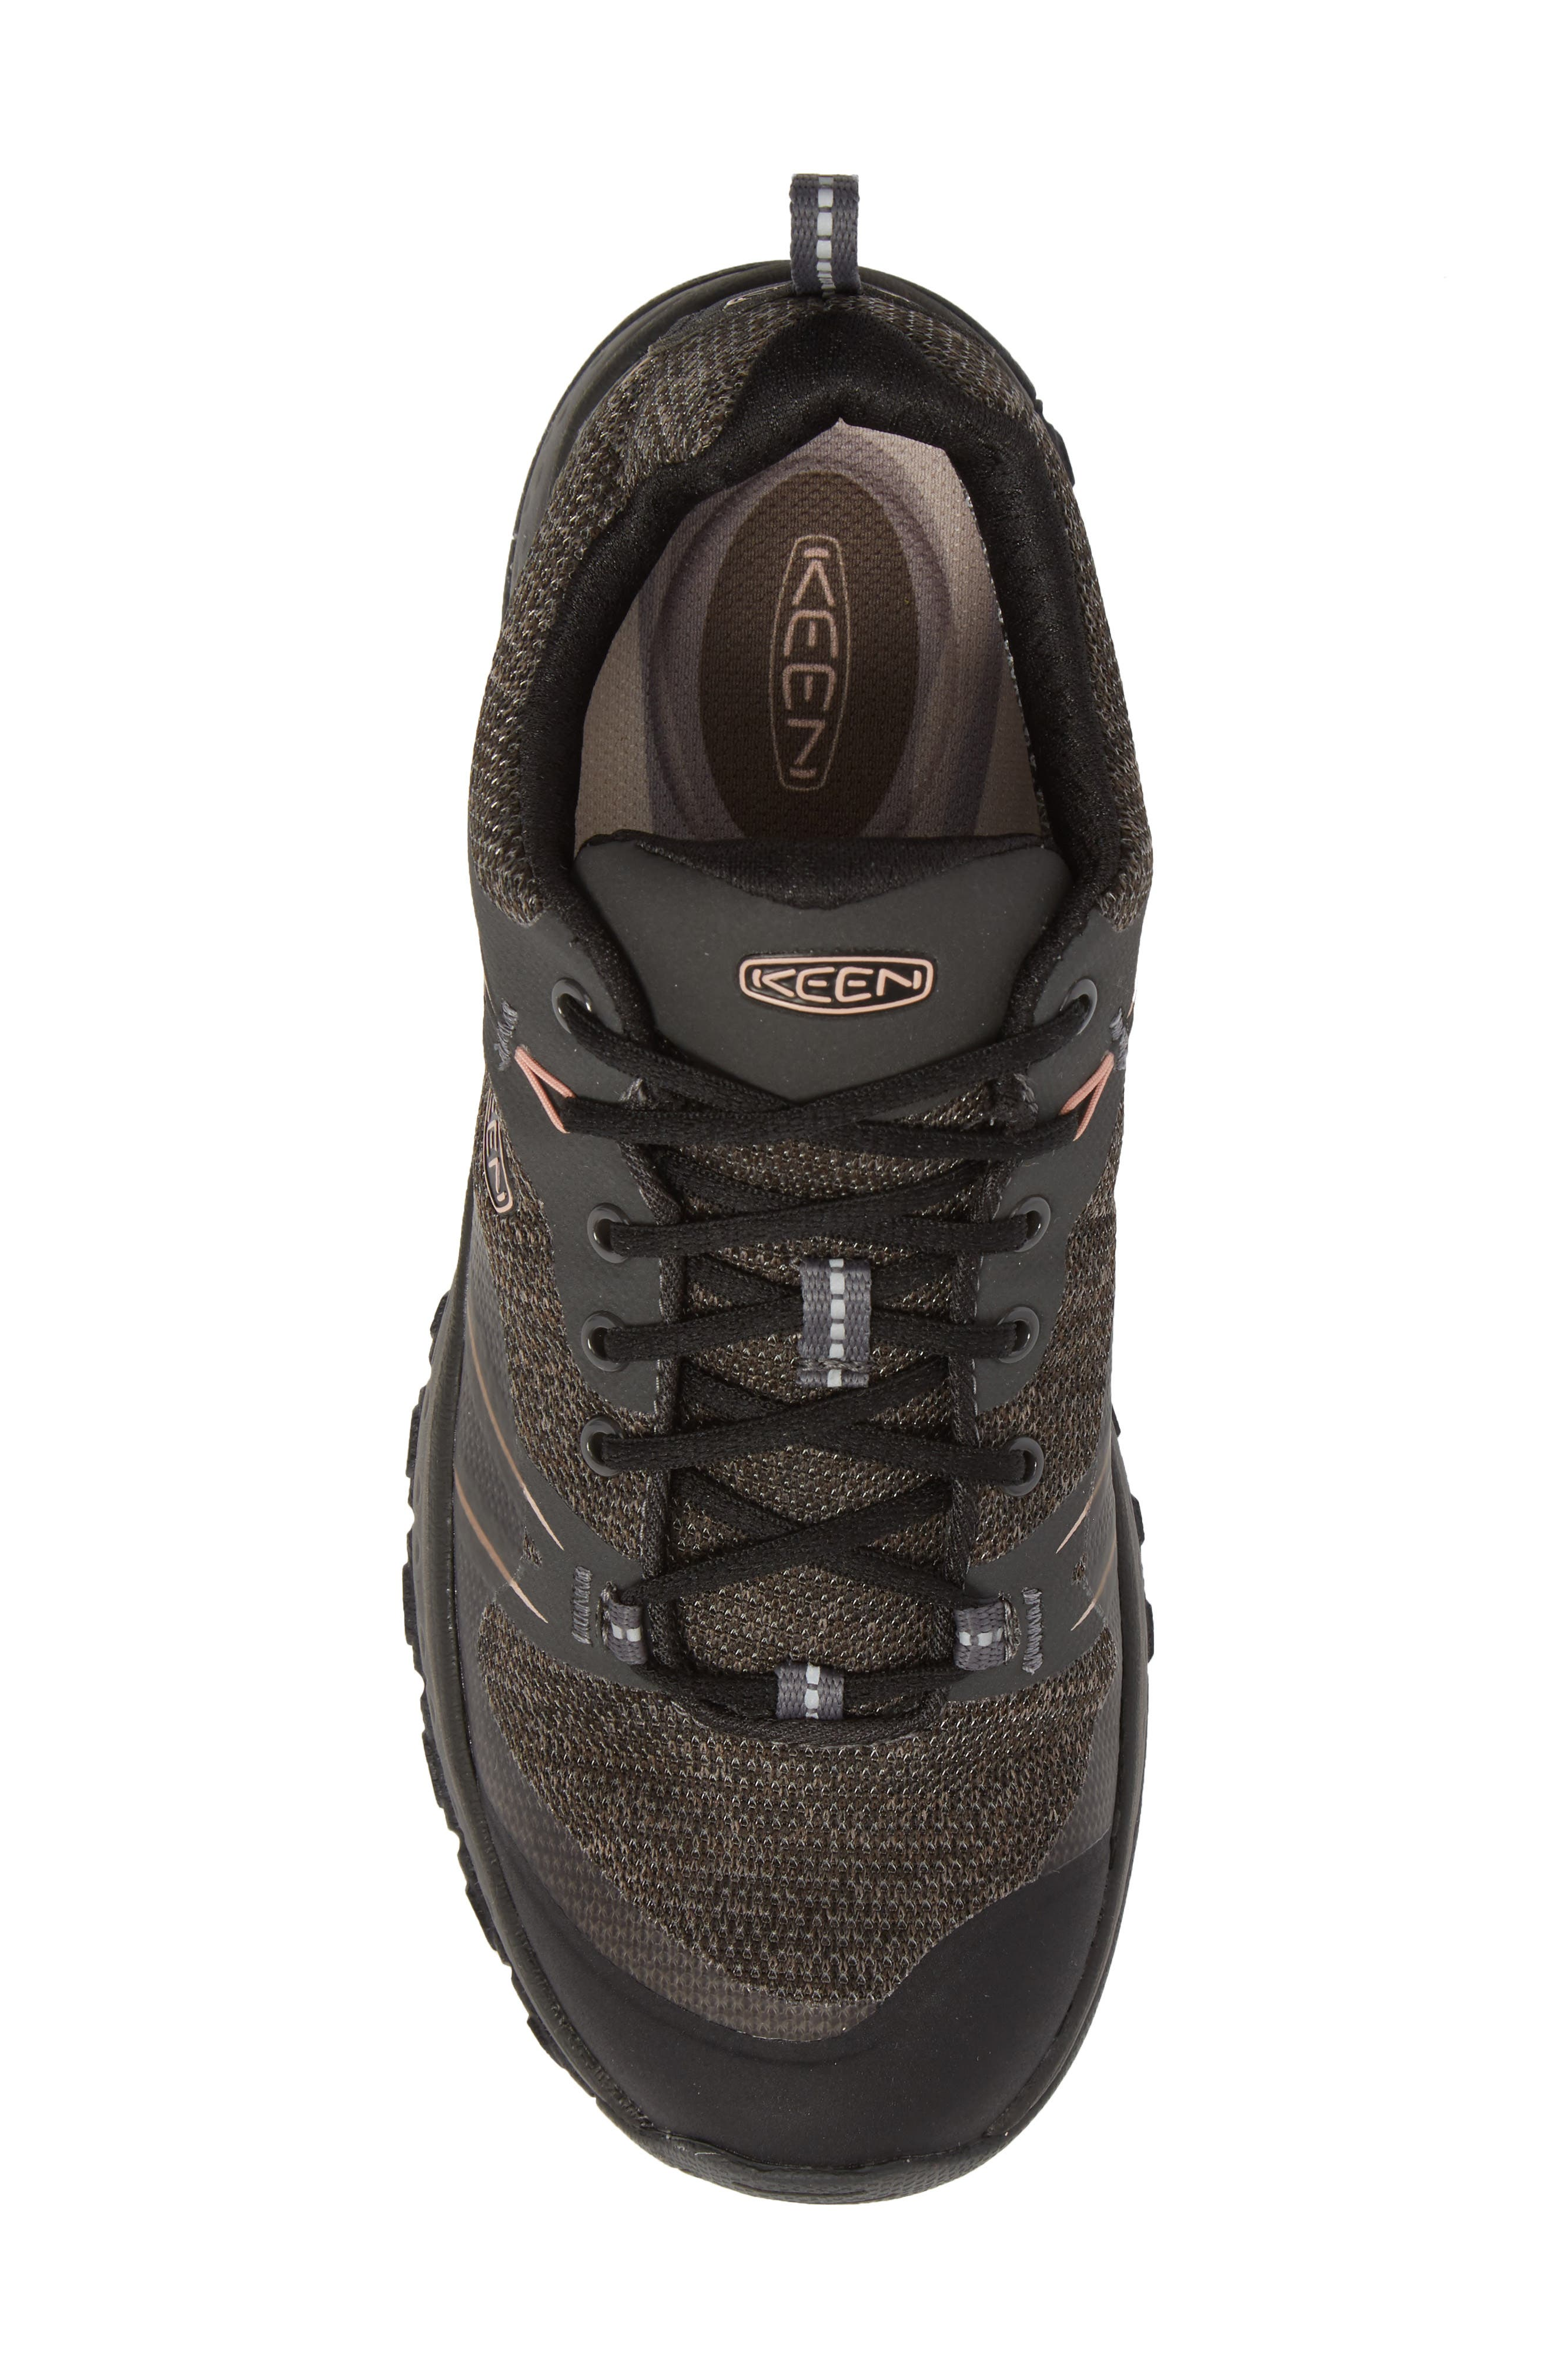 Terradora Waterproof Hiking Shoe,                             Alternate thumbnail 5, color,                             RAVEN/ ROSE DAWN